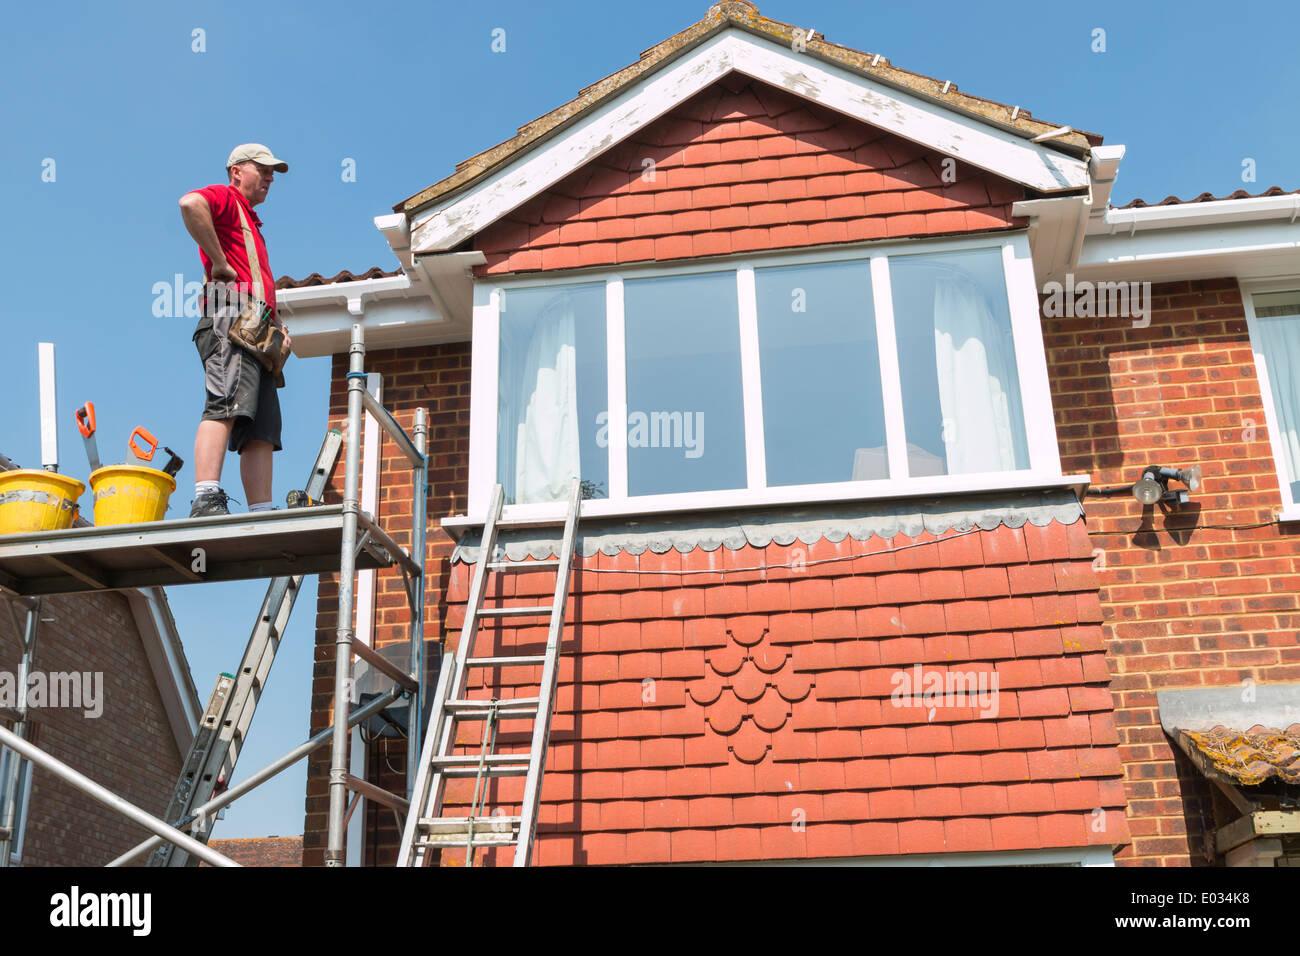 Tradesman Fitting New Fascia to House - Stock Image